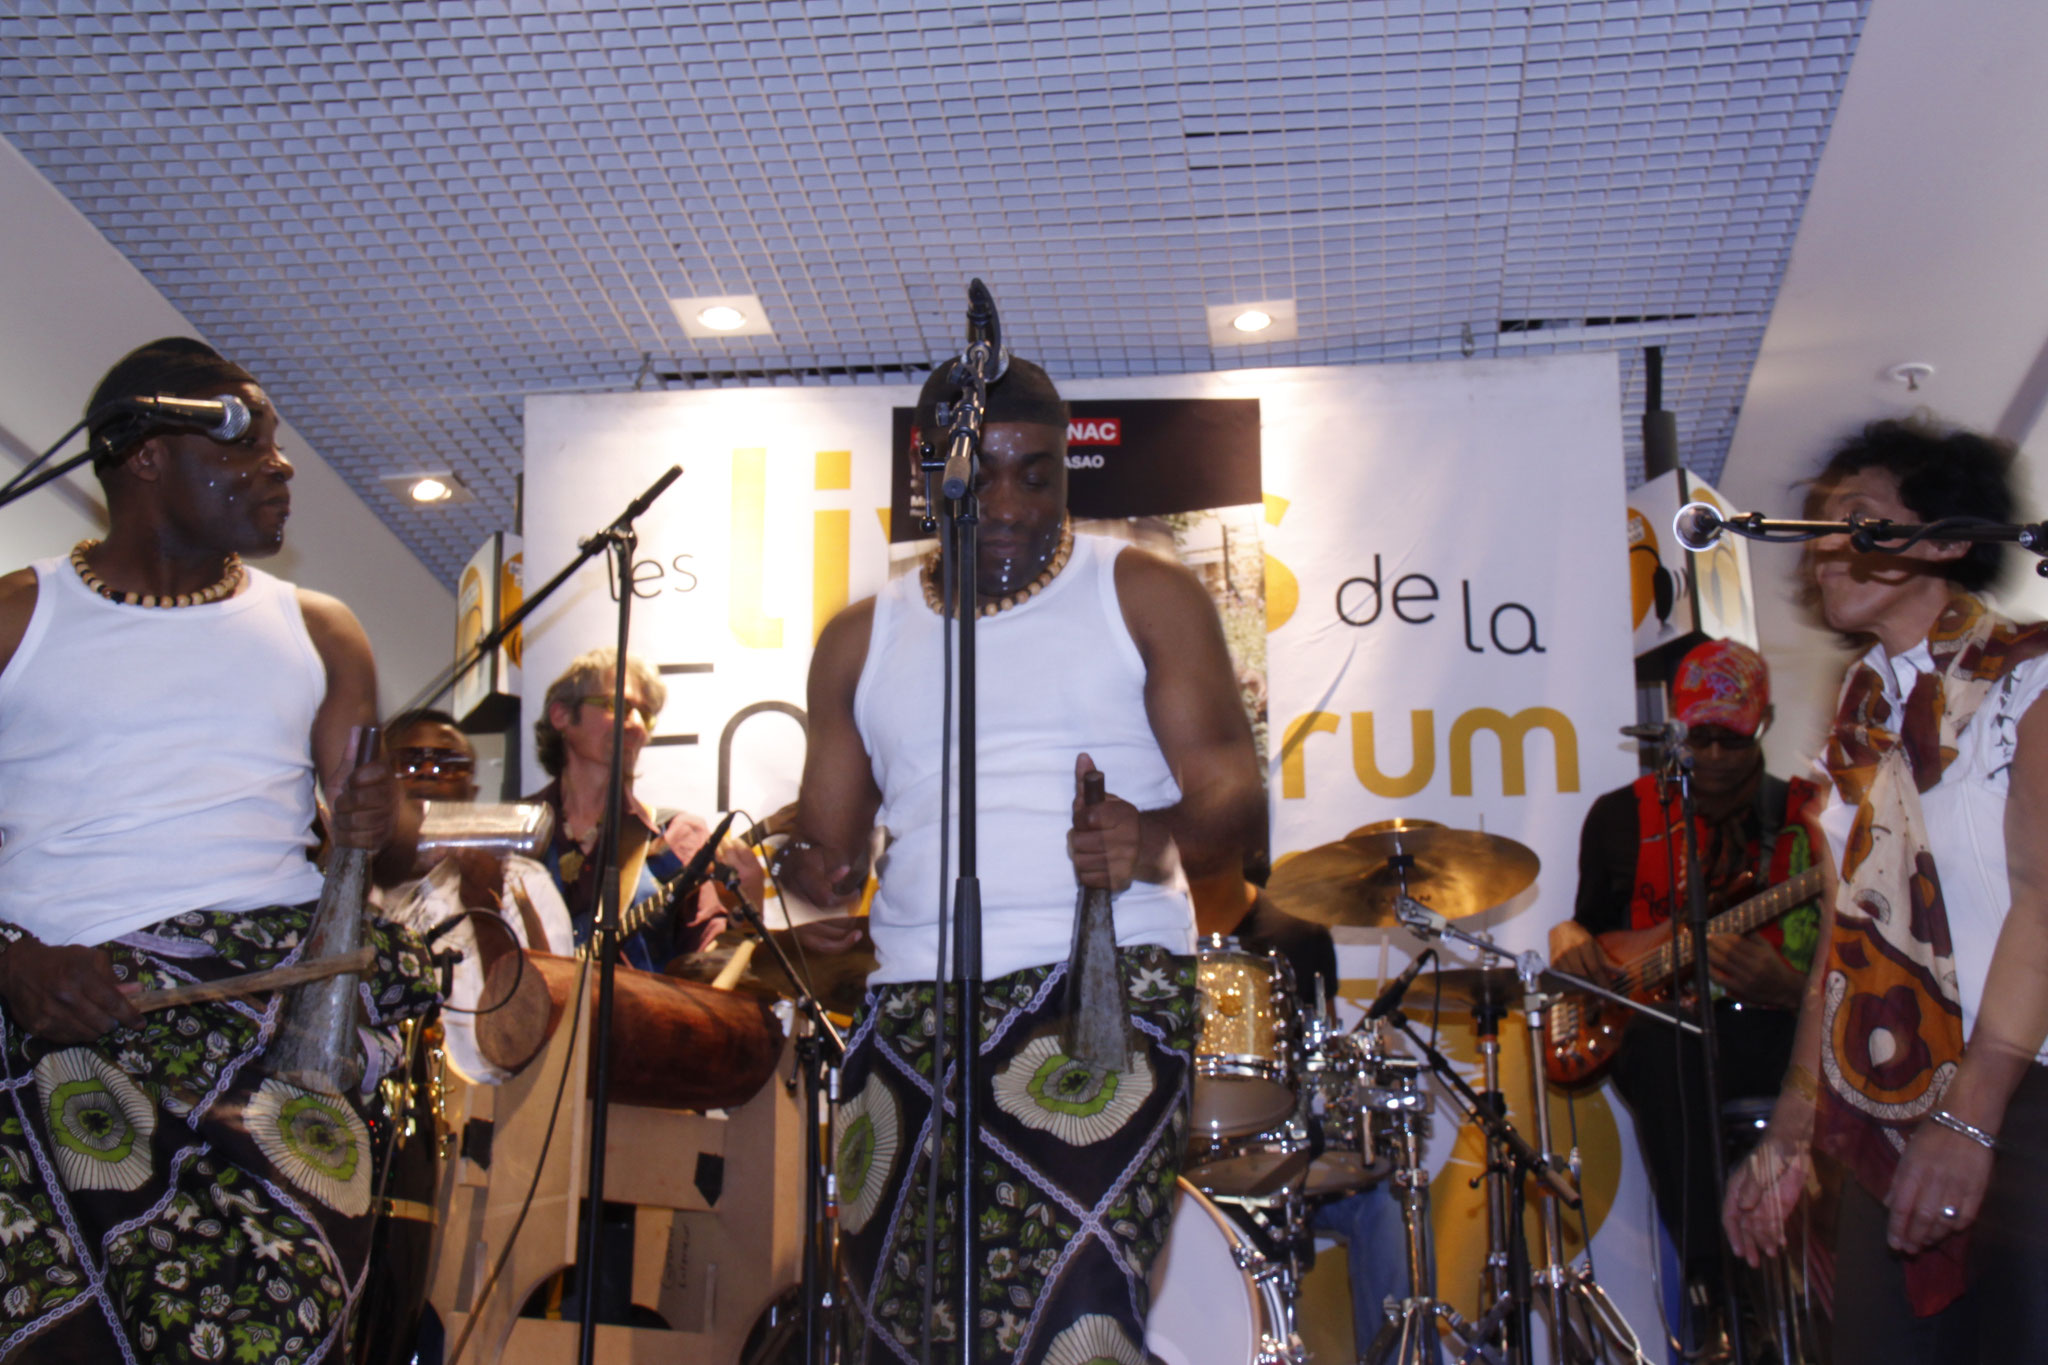 Les Jumeaux de MASAO (Masao Masu) live in the Fnac Chatelet les Halles   . Photo : Michel Abdebreman